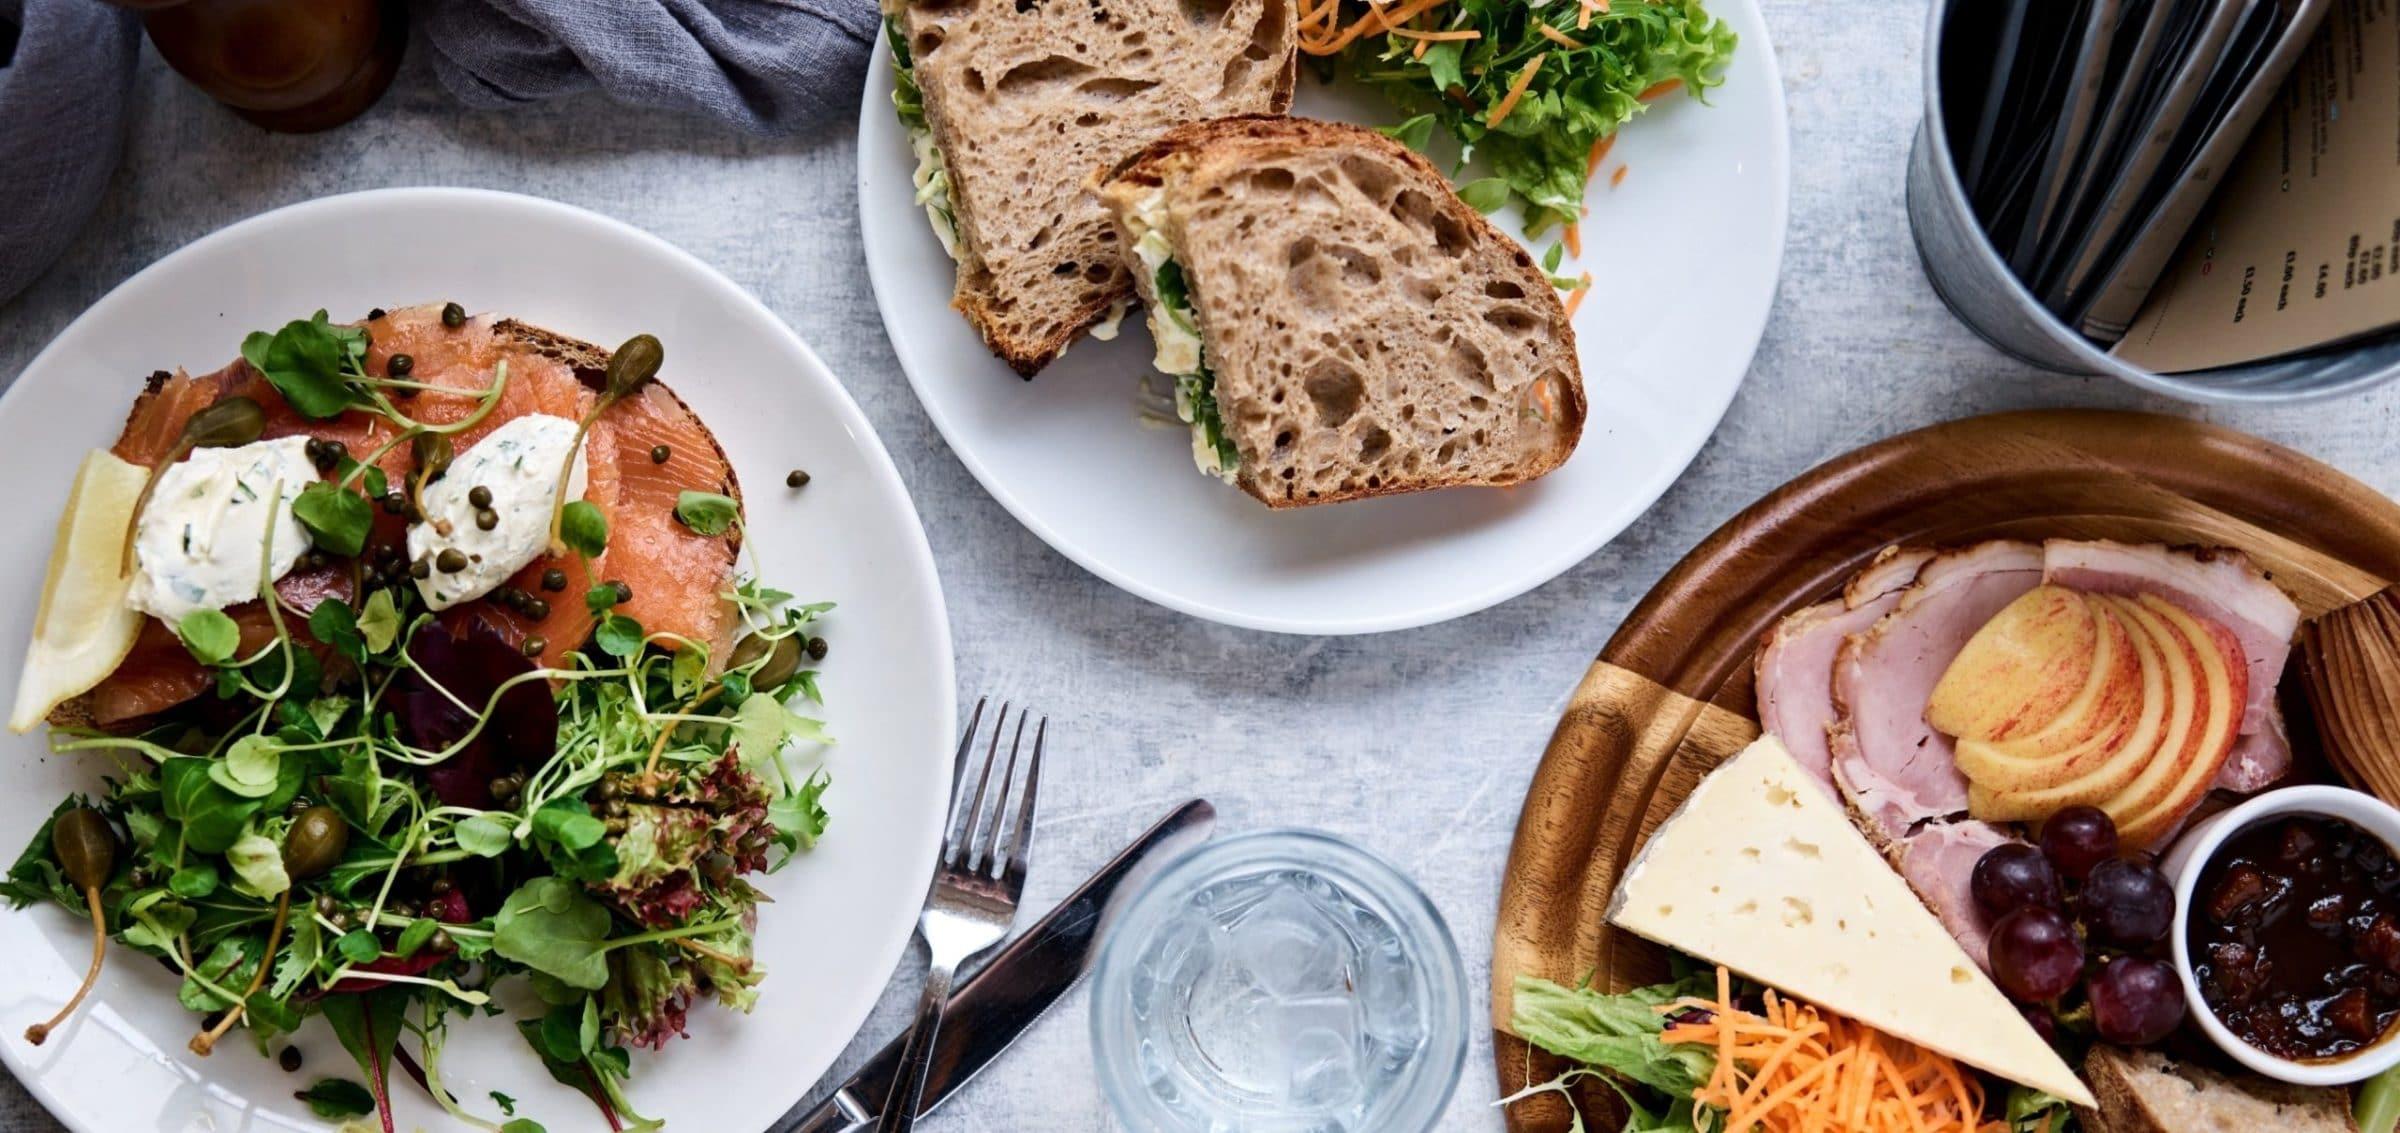 plates of food steffs website 2